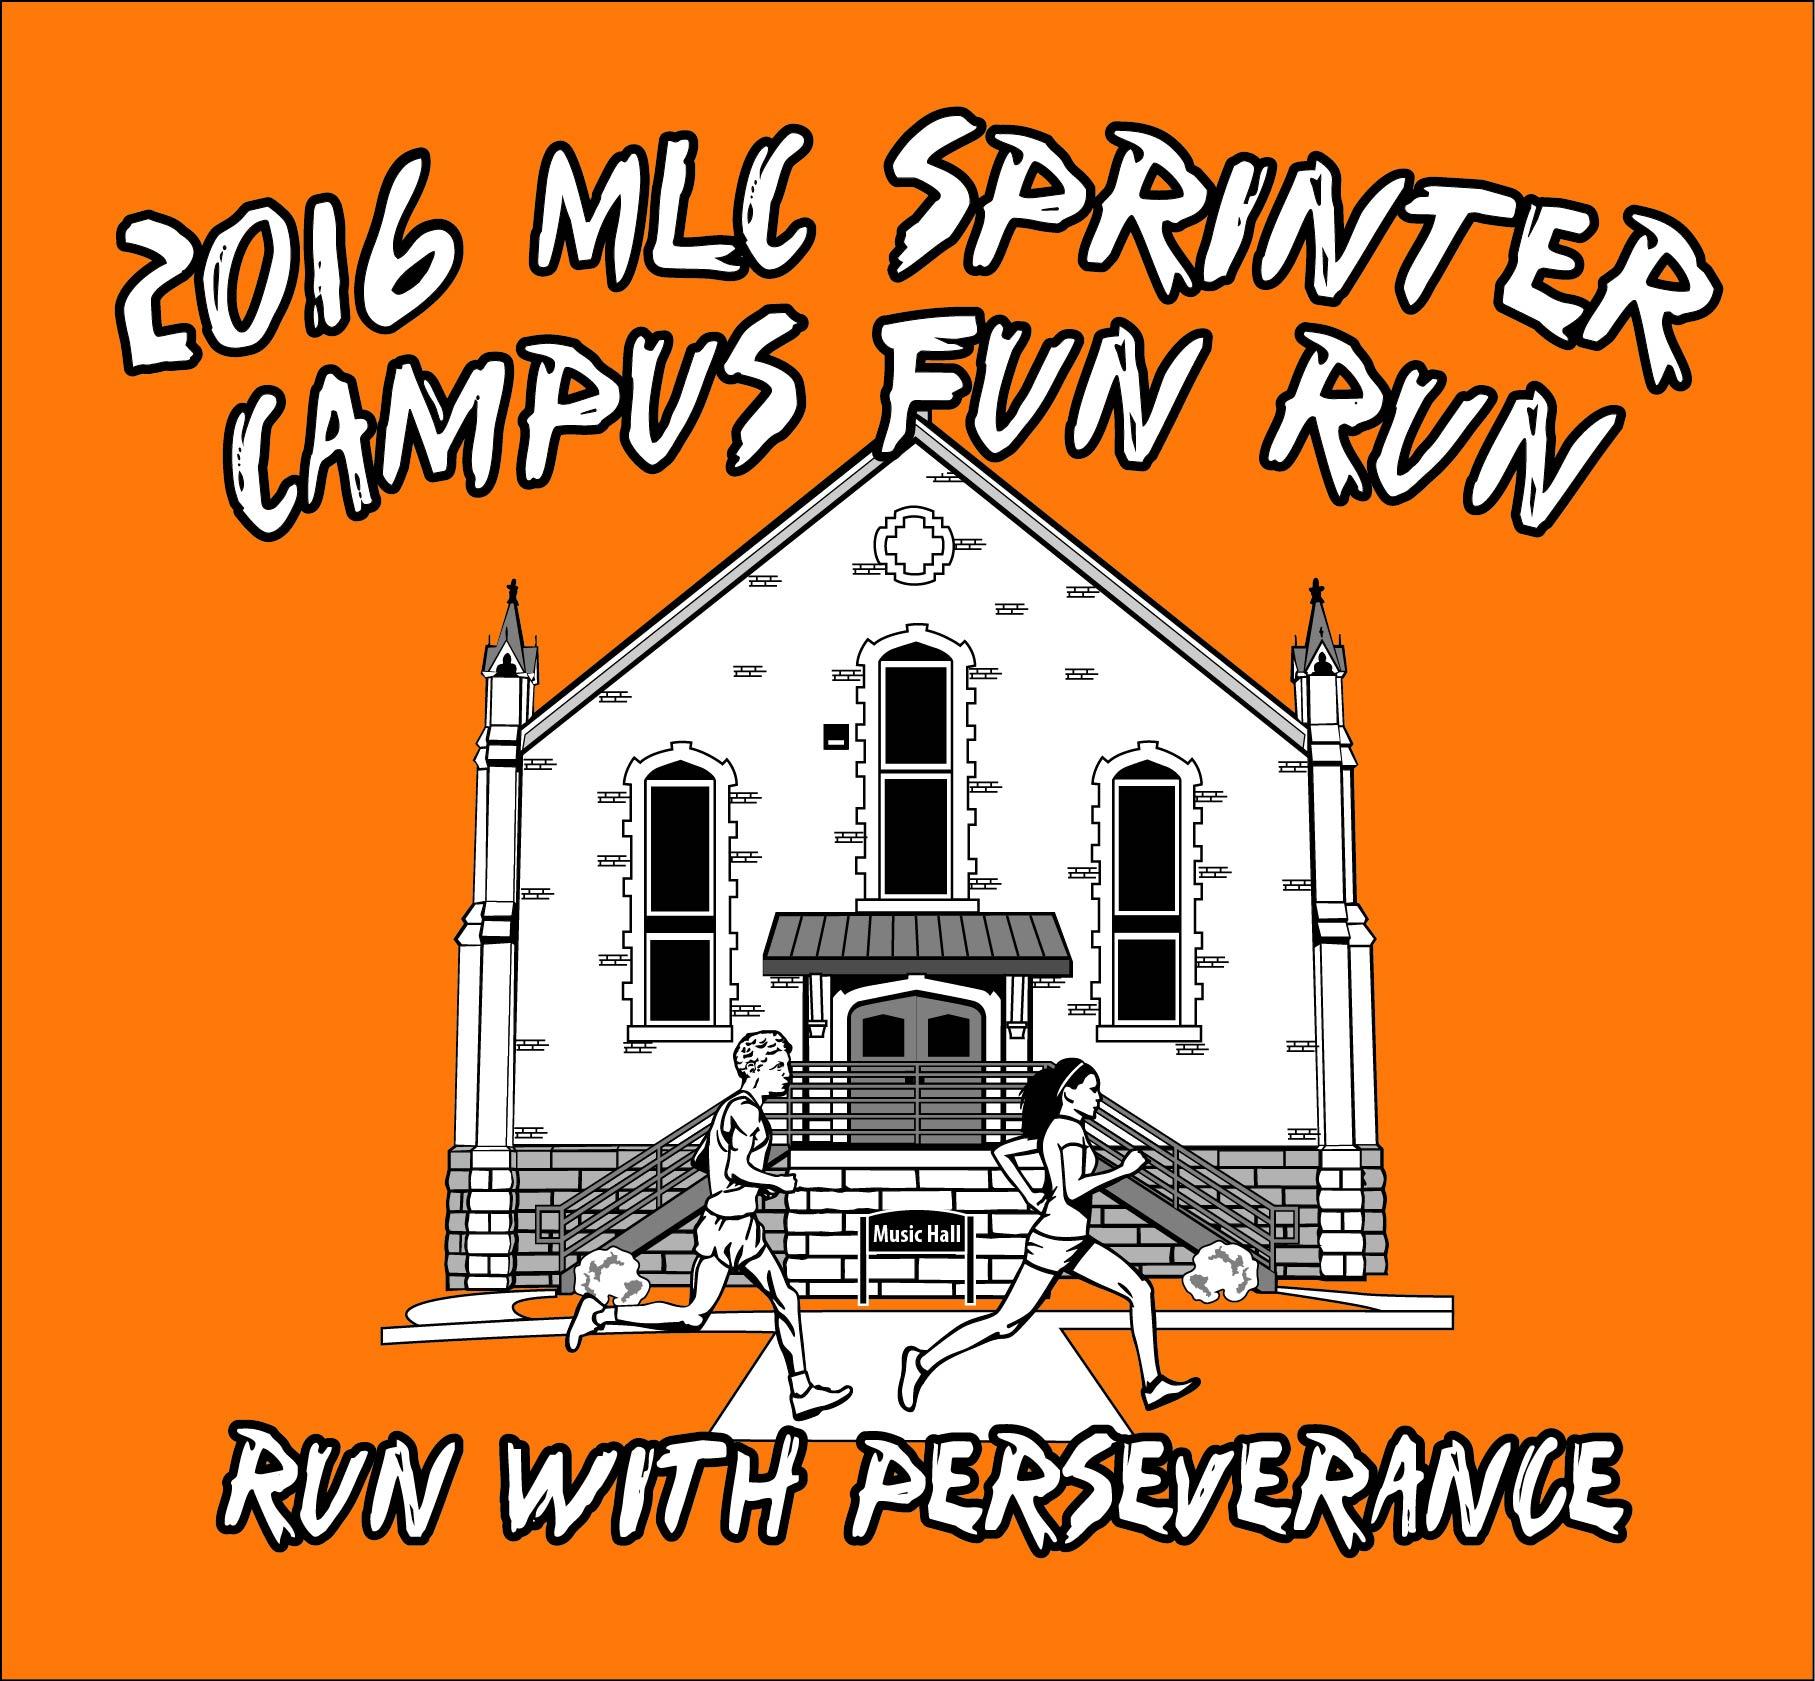 2016 Sprinter Fun Run Shirt Design